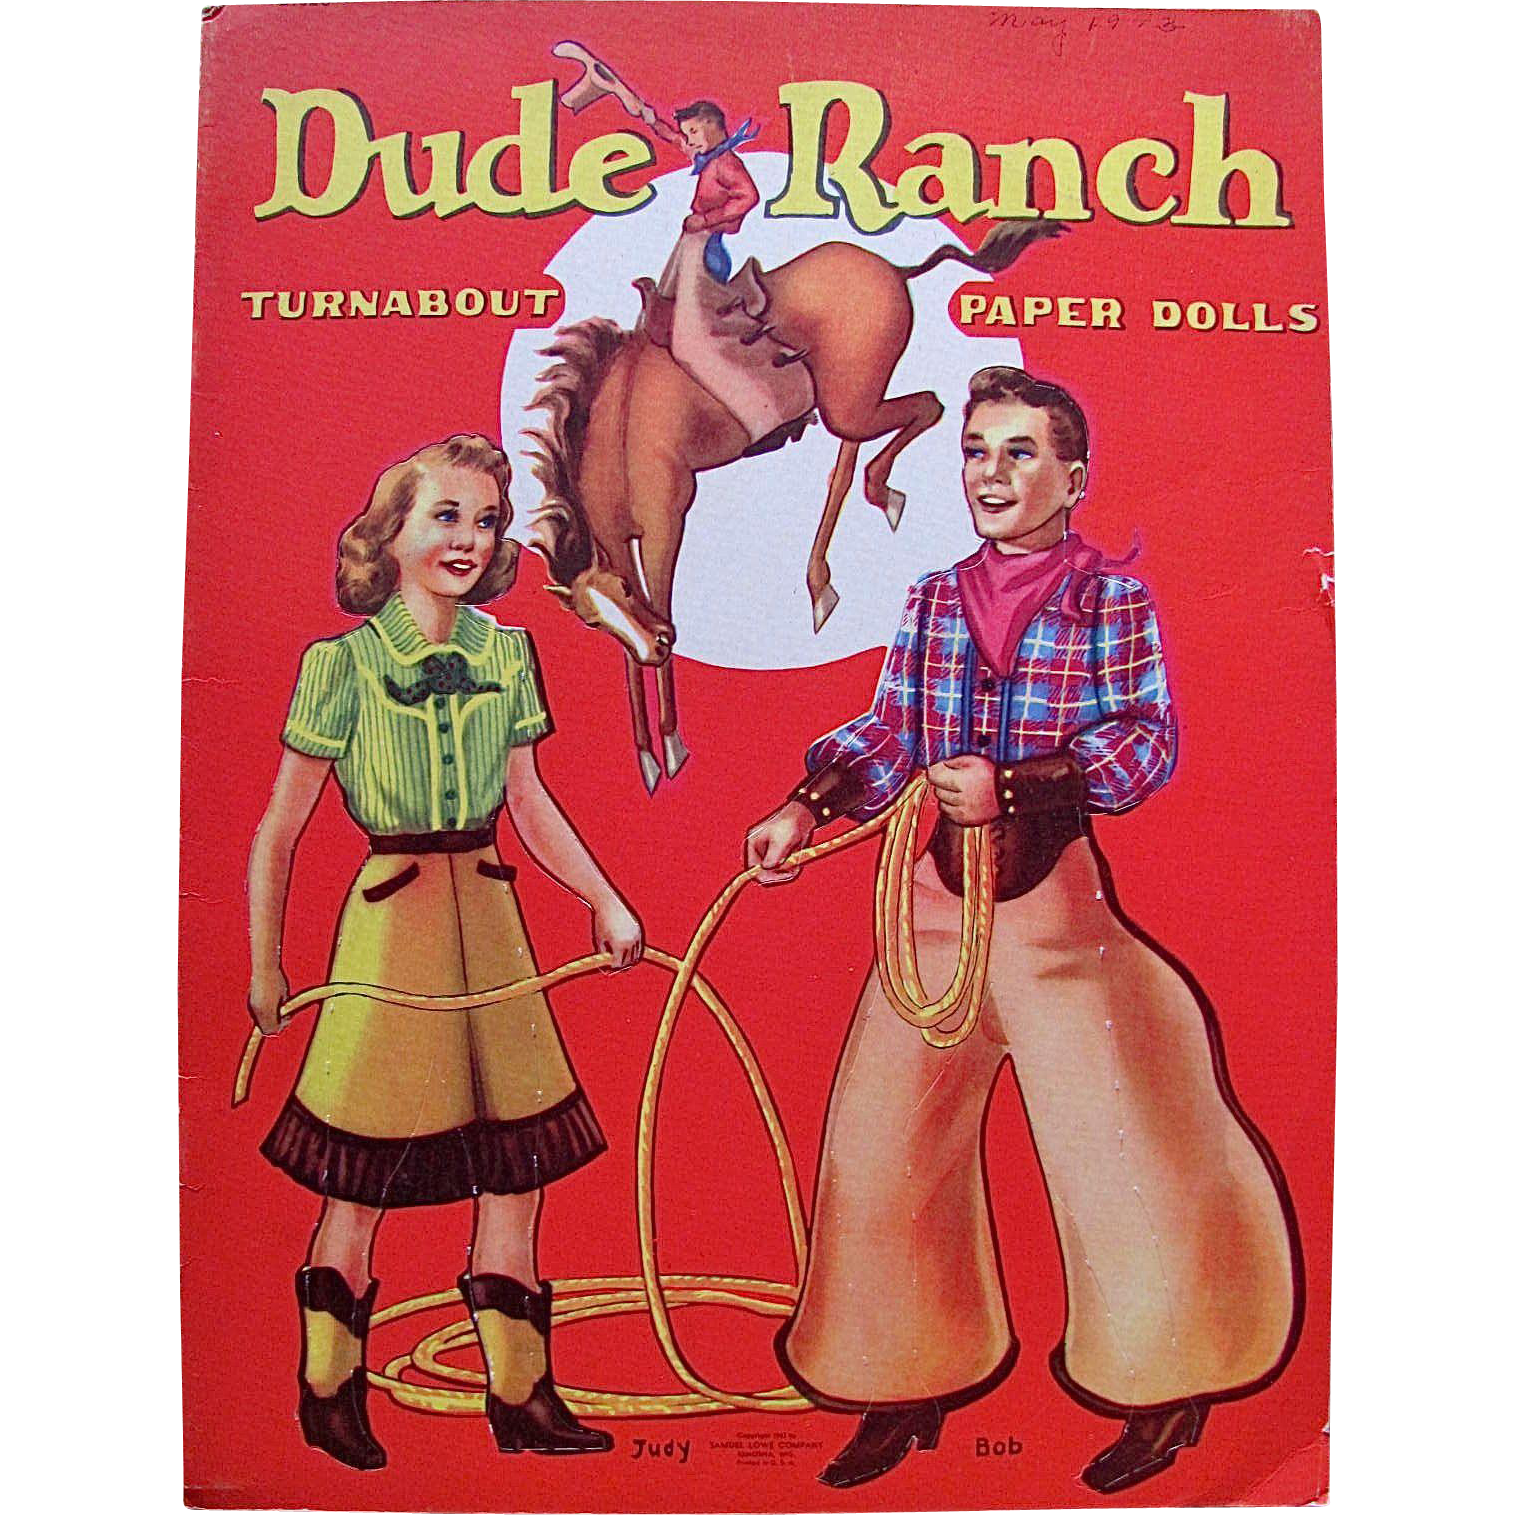 Dude Ranch Turnabout Paper Dolls, Uncut, Samuel Lowe, Vintage 1943